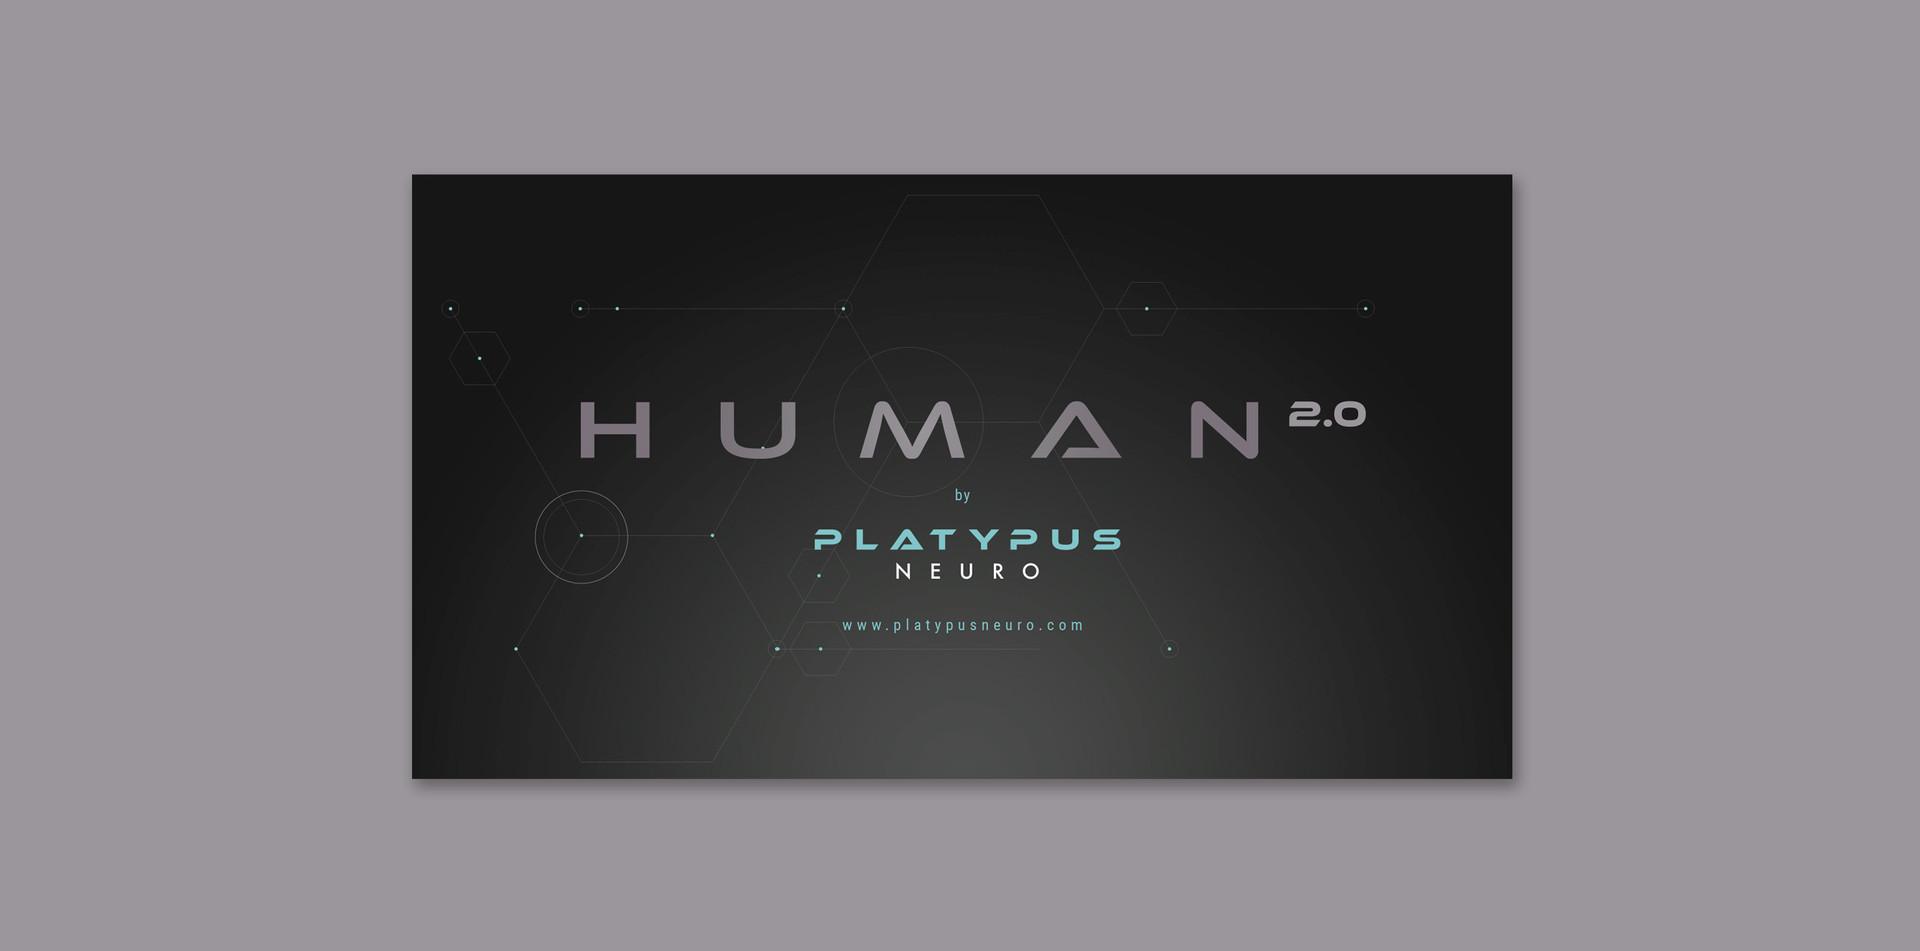 PlatypusNeuro   Human 2.0 Logo